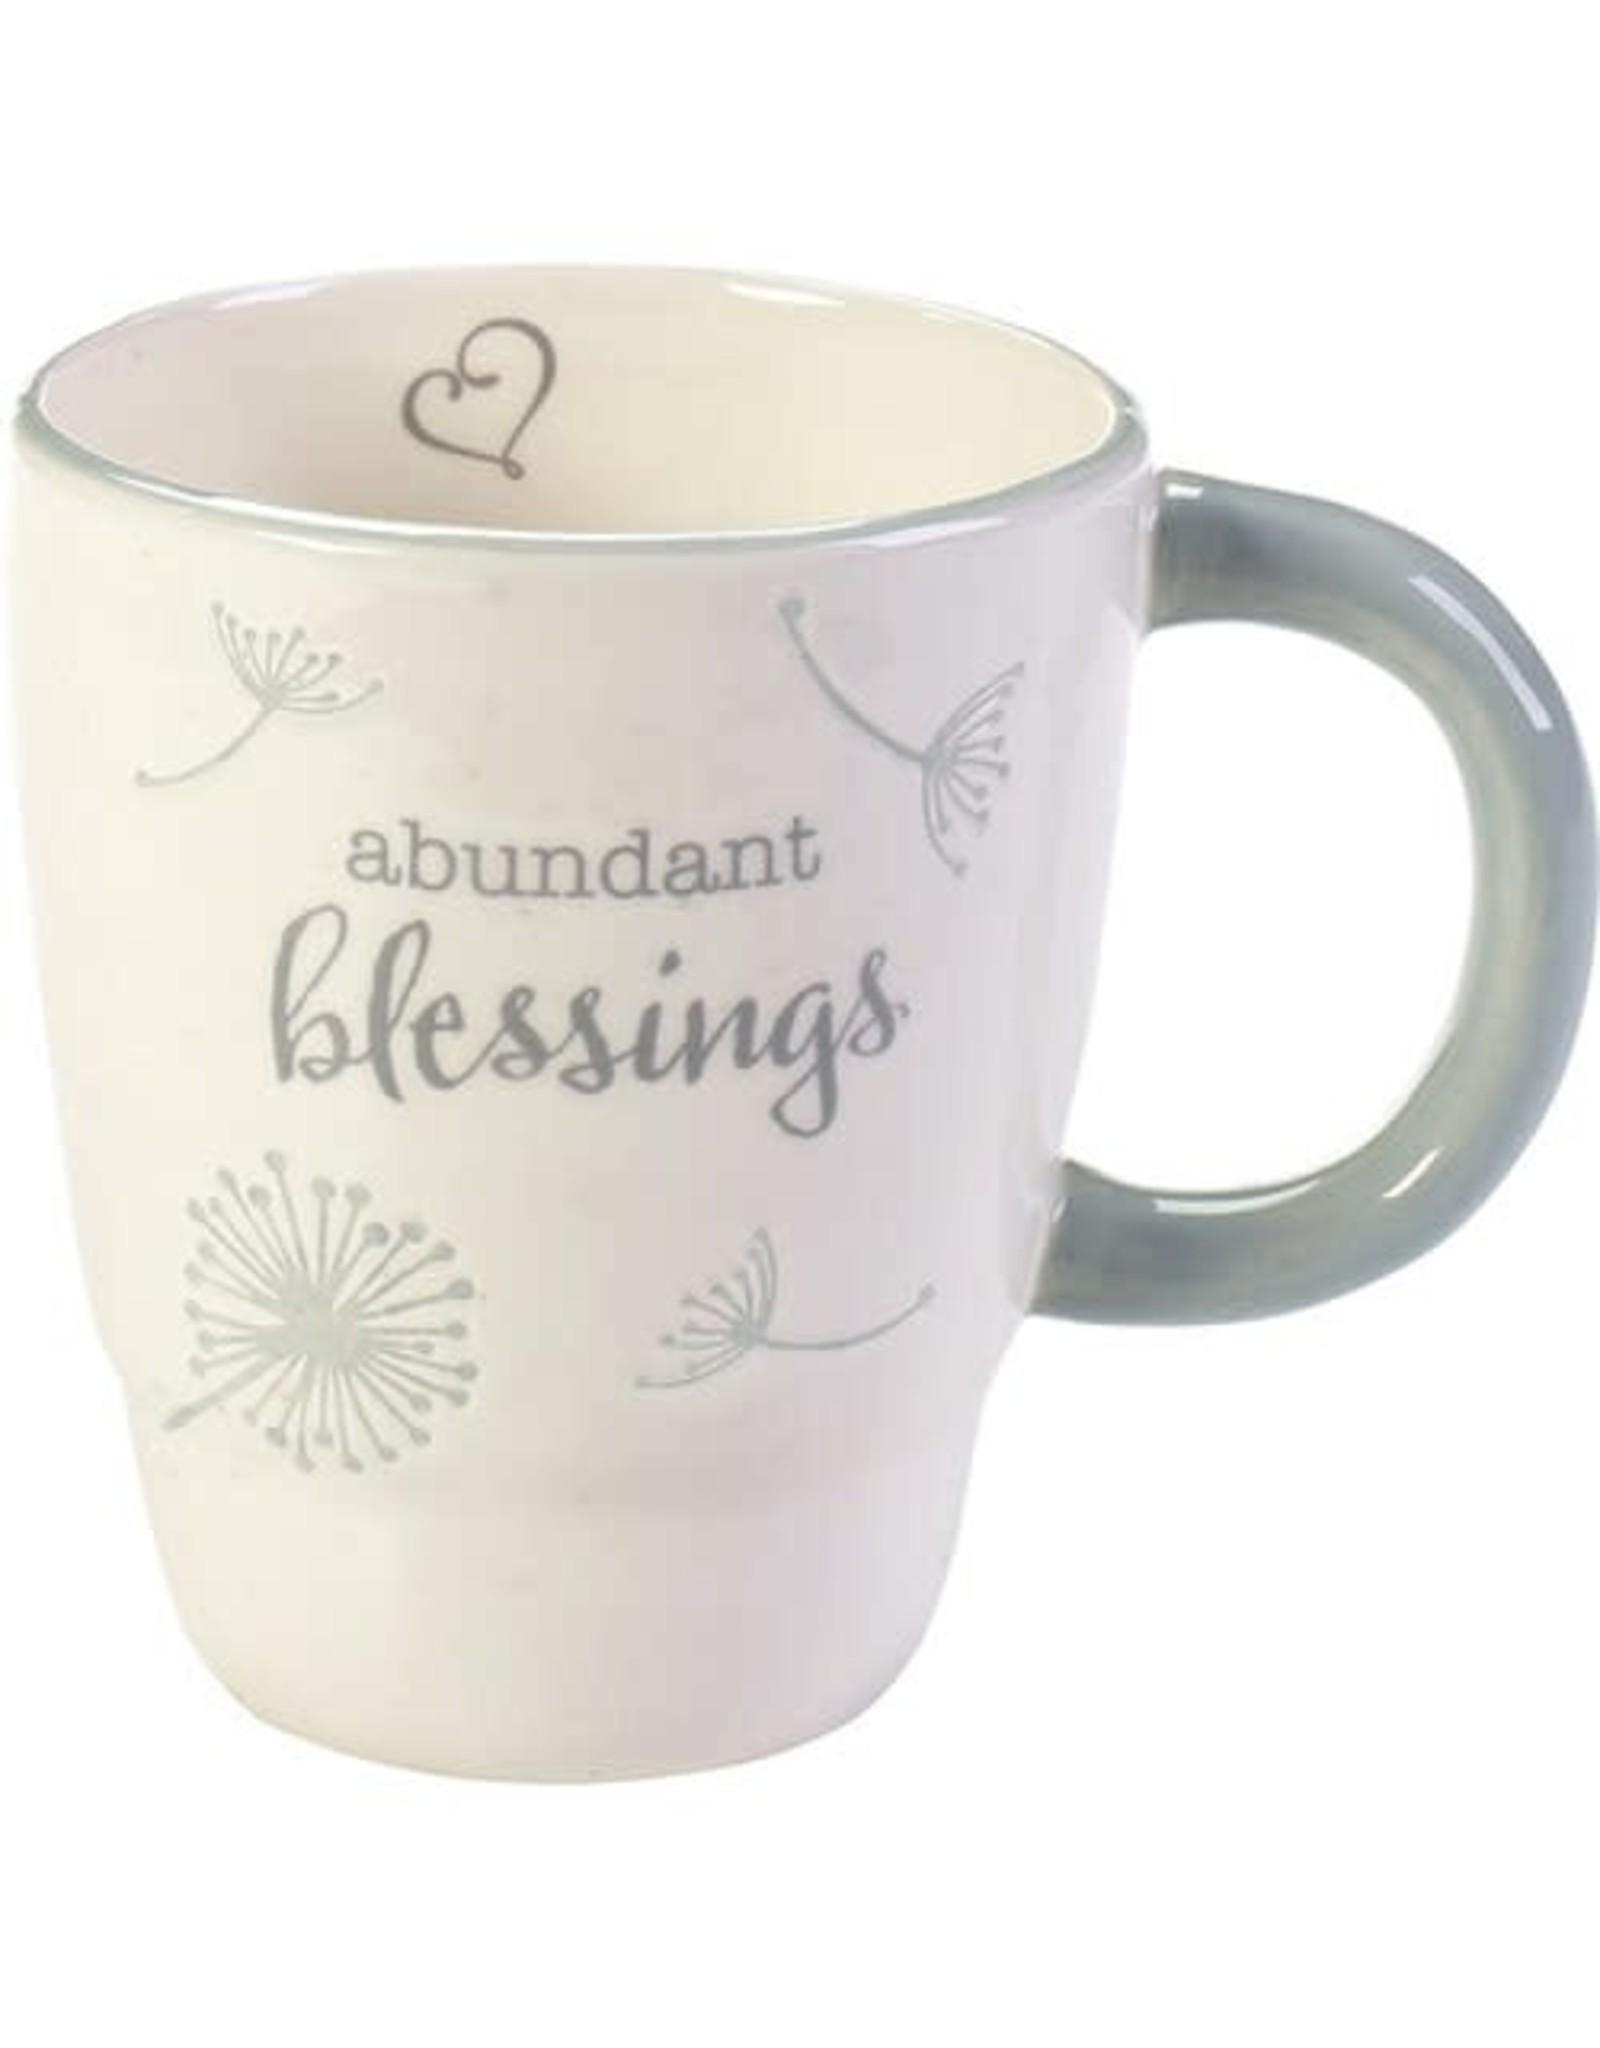 Precious Moments Abundant Blessings Mug